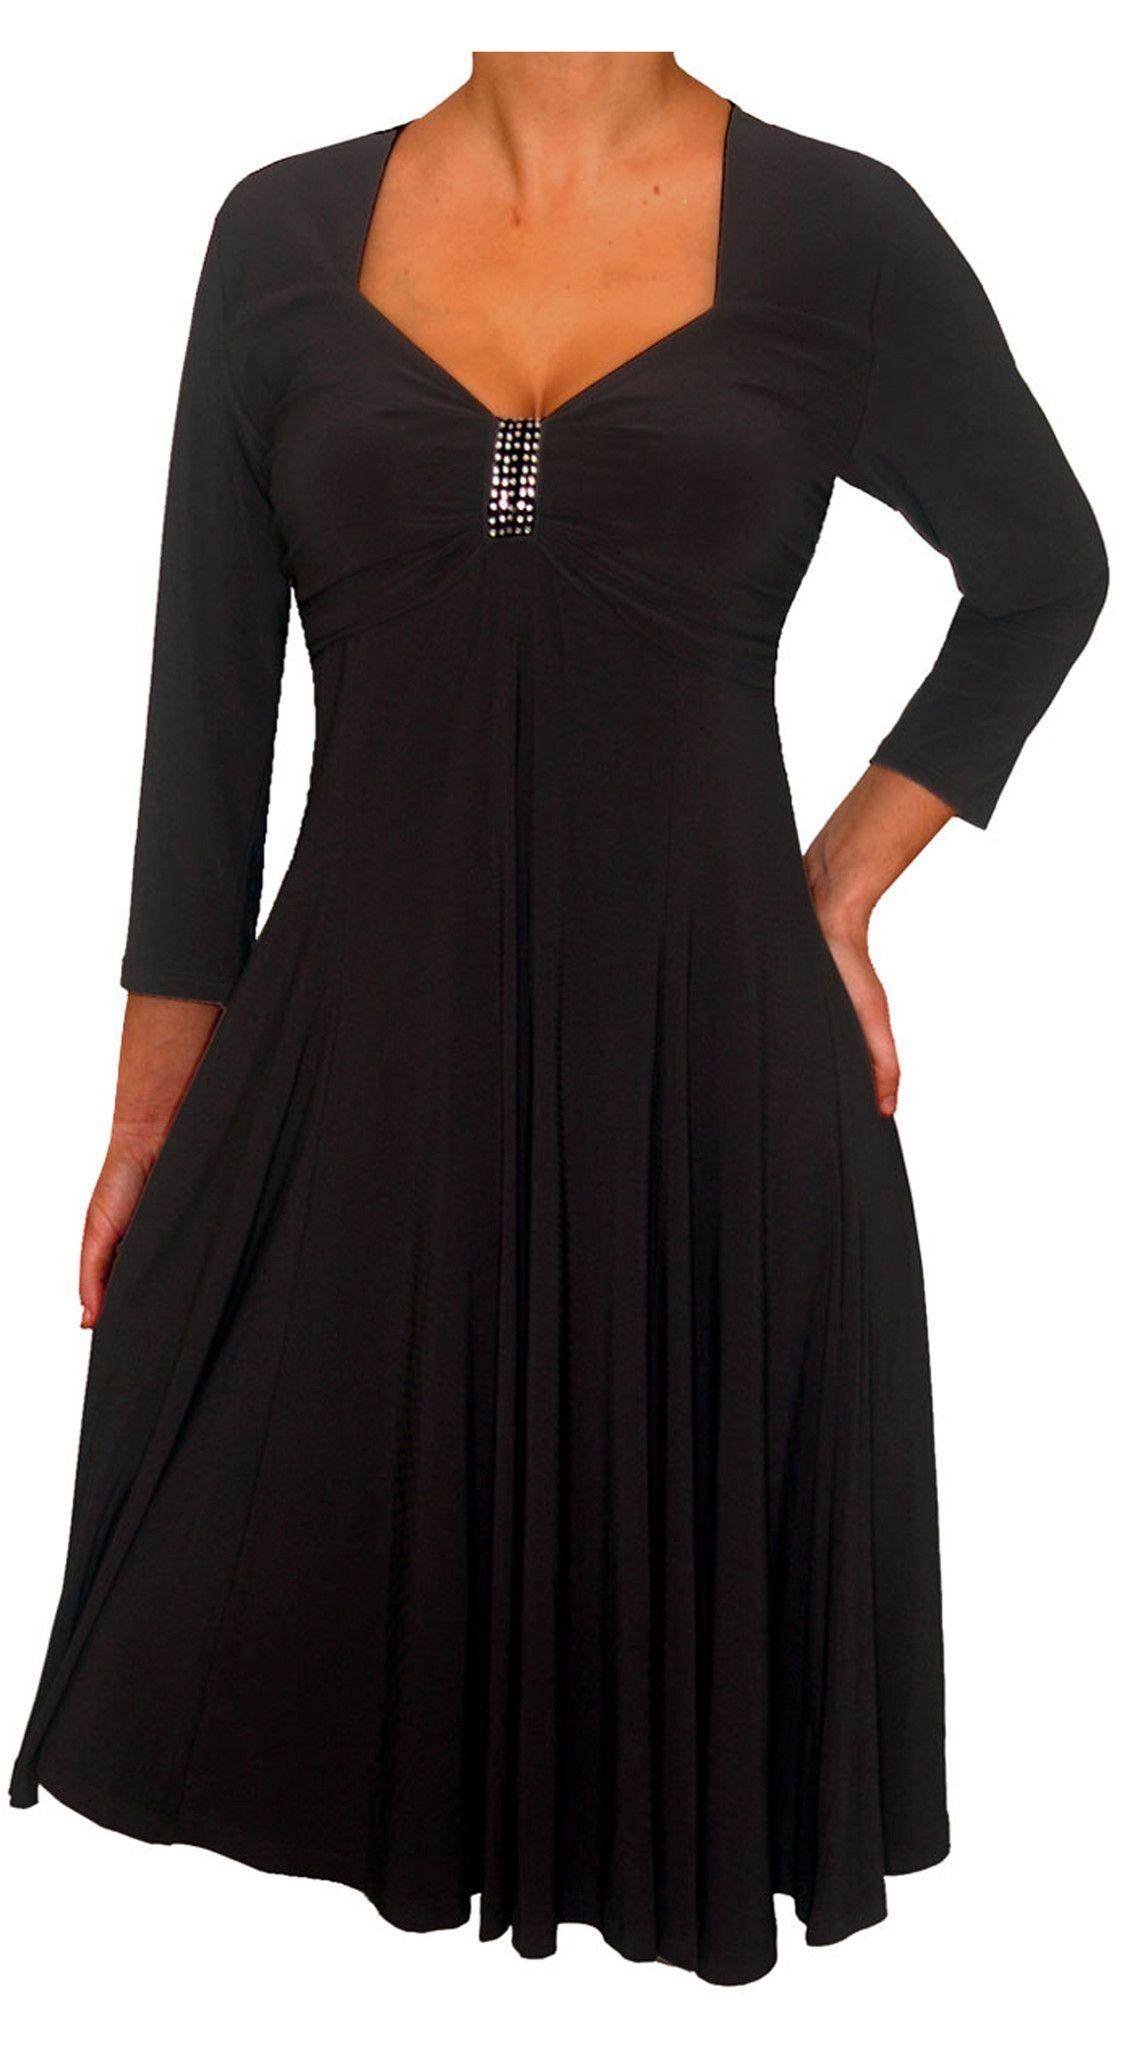 Funfash plus size black dress long sleeves black empire waist